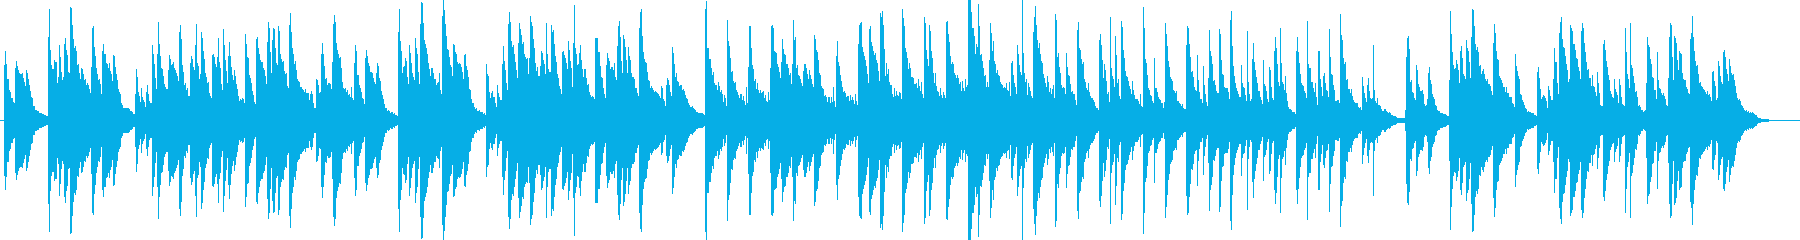 CM Vlogなどせつないピアノ系BGMの再生済みの波形